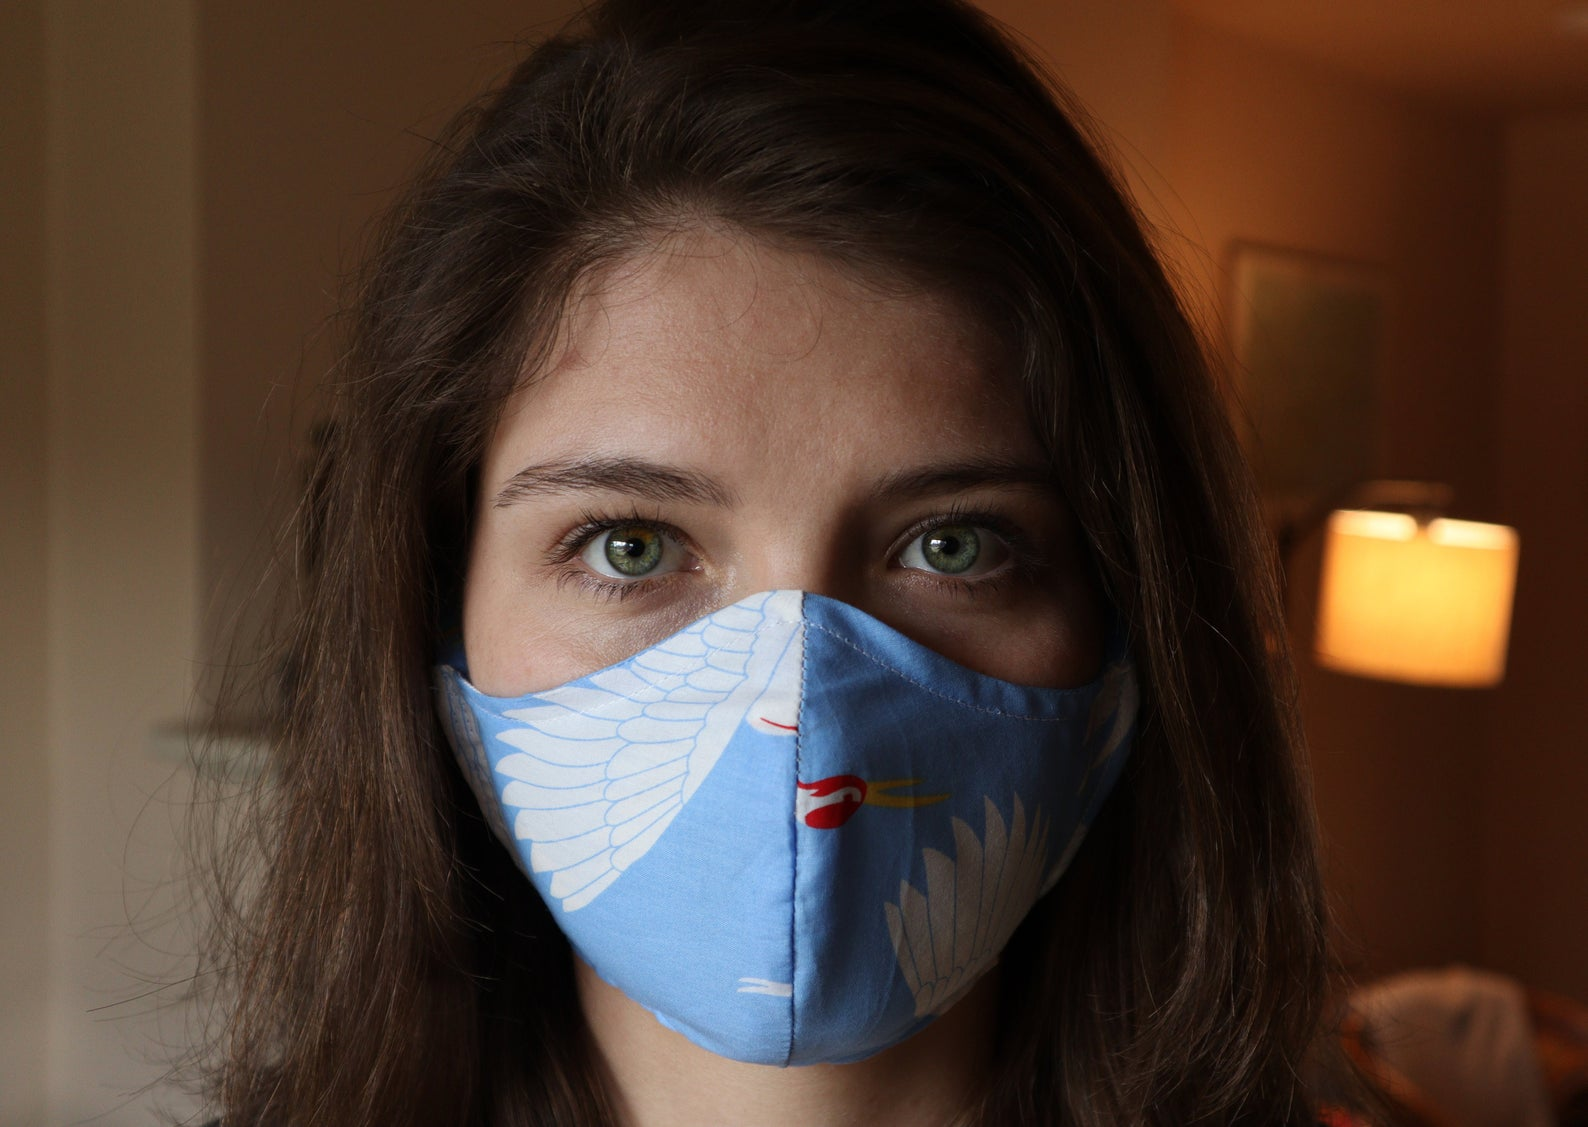 Where To Buy Reusable Face Masks